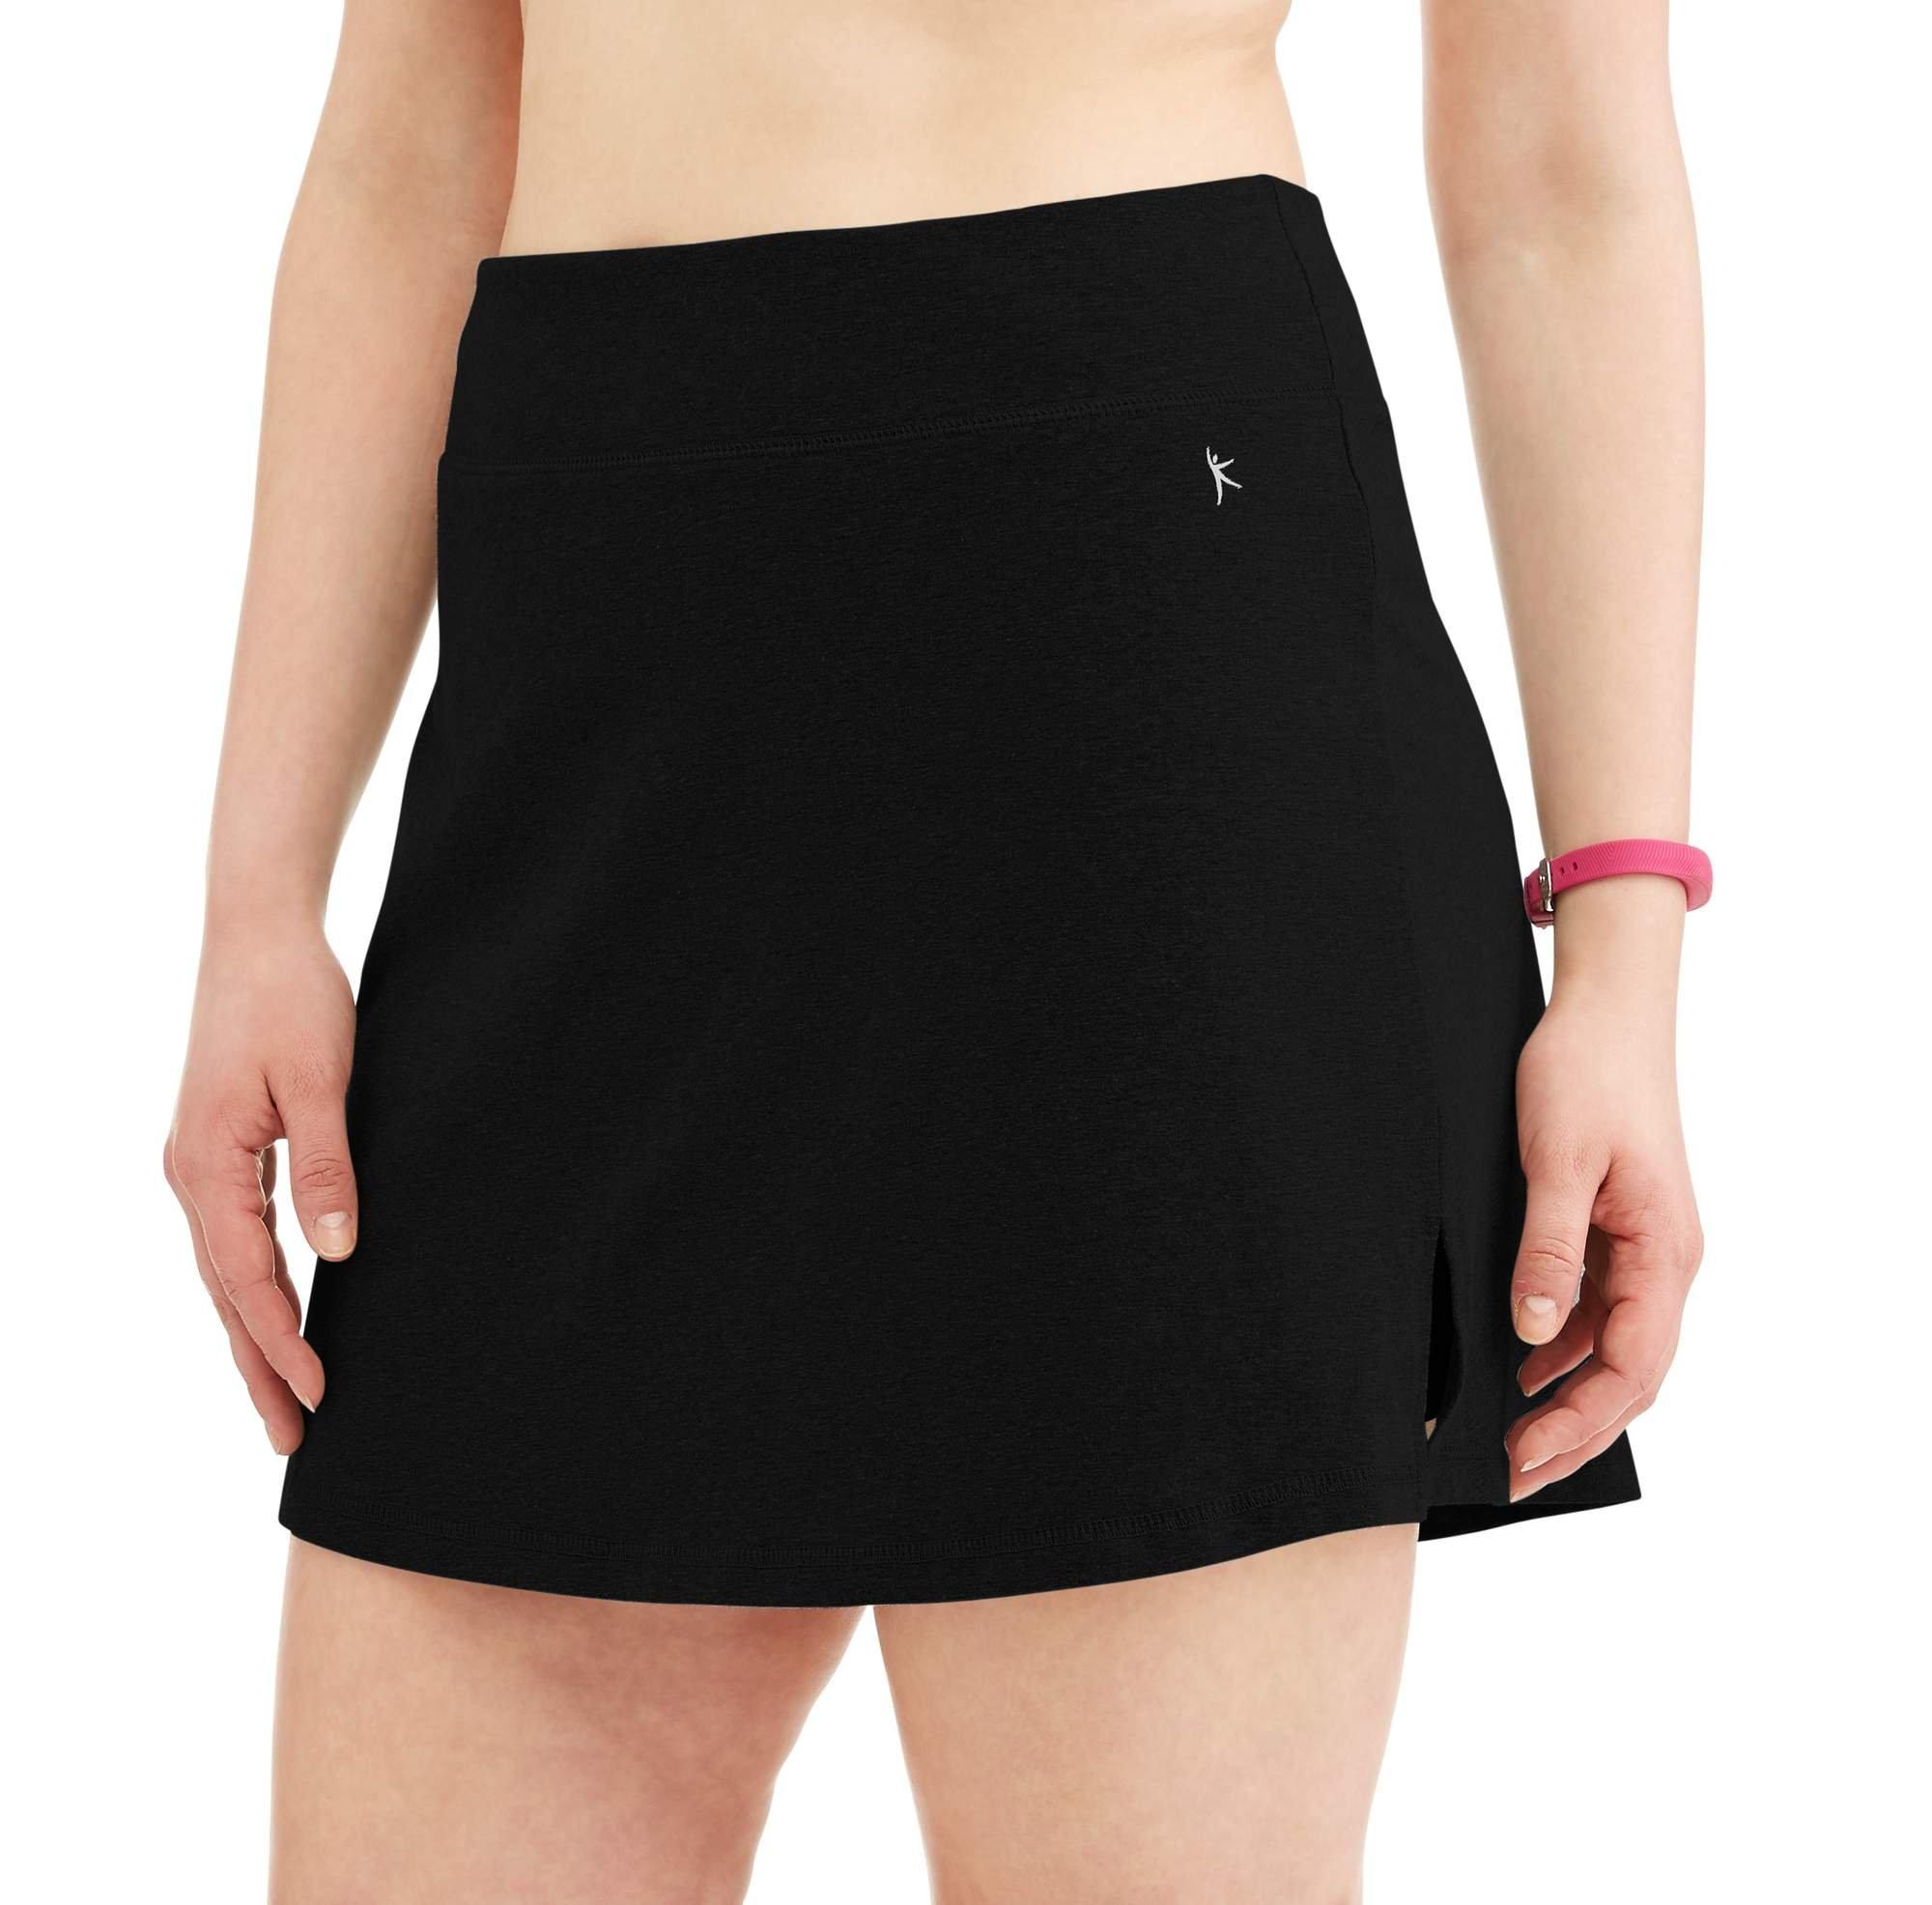 Danskin Now Women's Plus Size Activewear Athletic Cotton Blend Skort/Skirt with Built in Shorts (Black, 1X (16W))